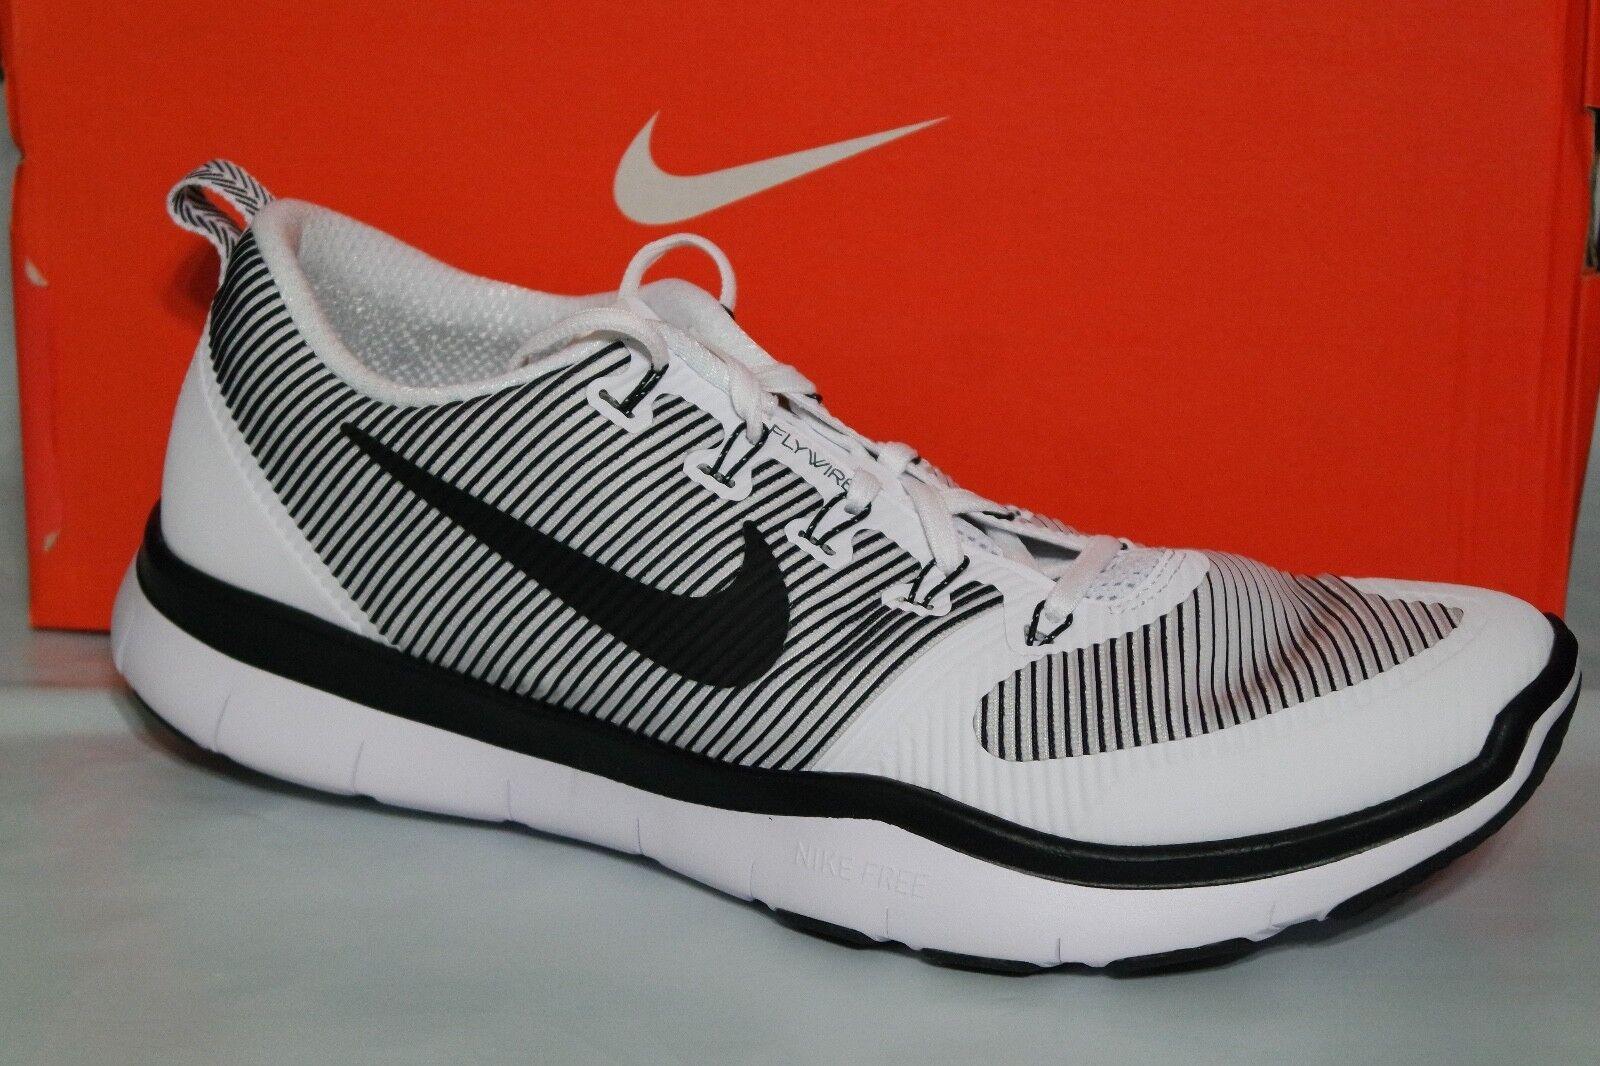 Nike libera treno versatilità gli scarpa, bianco / nero, 833258 100